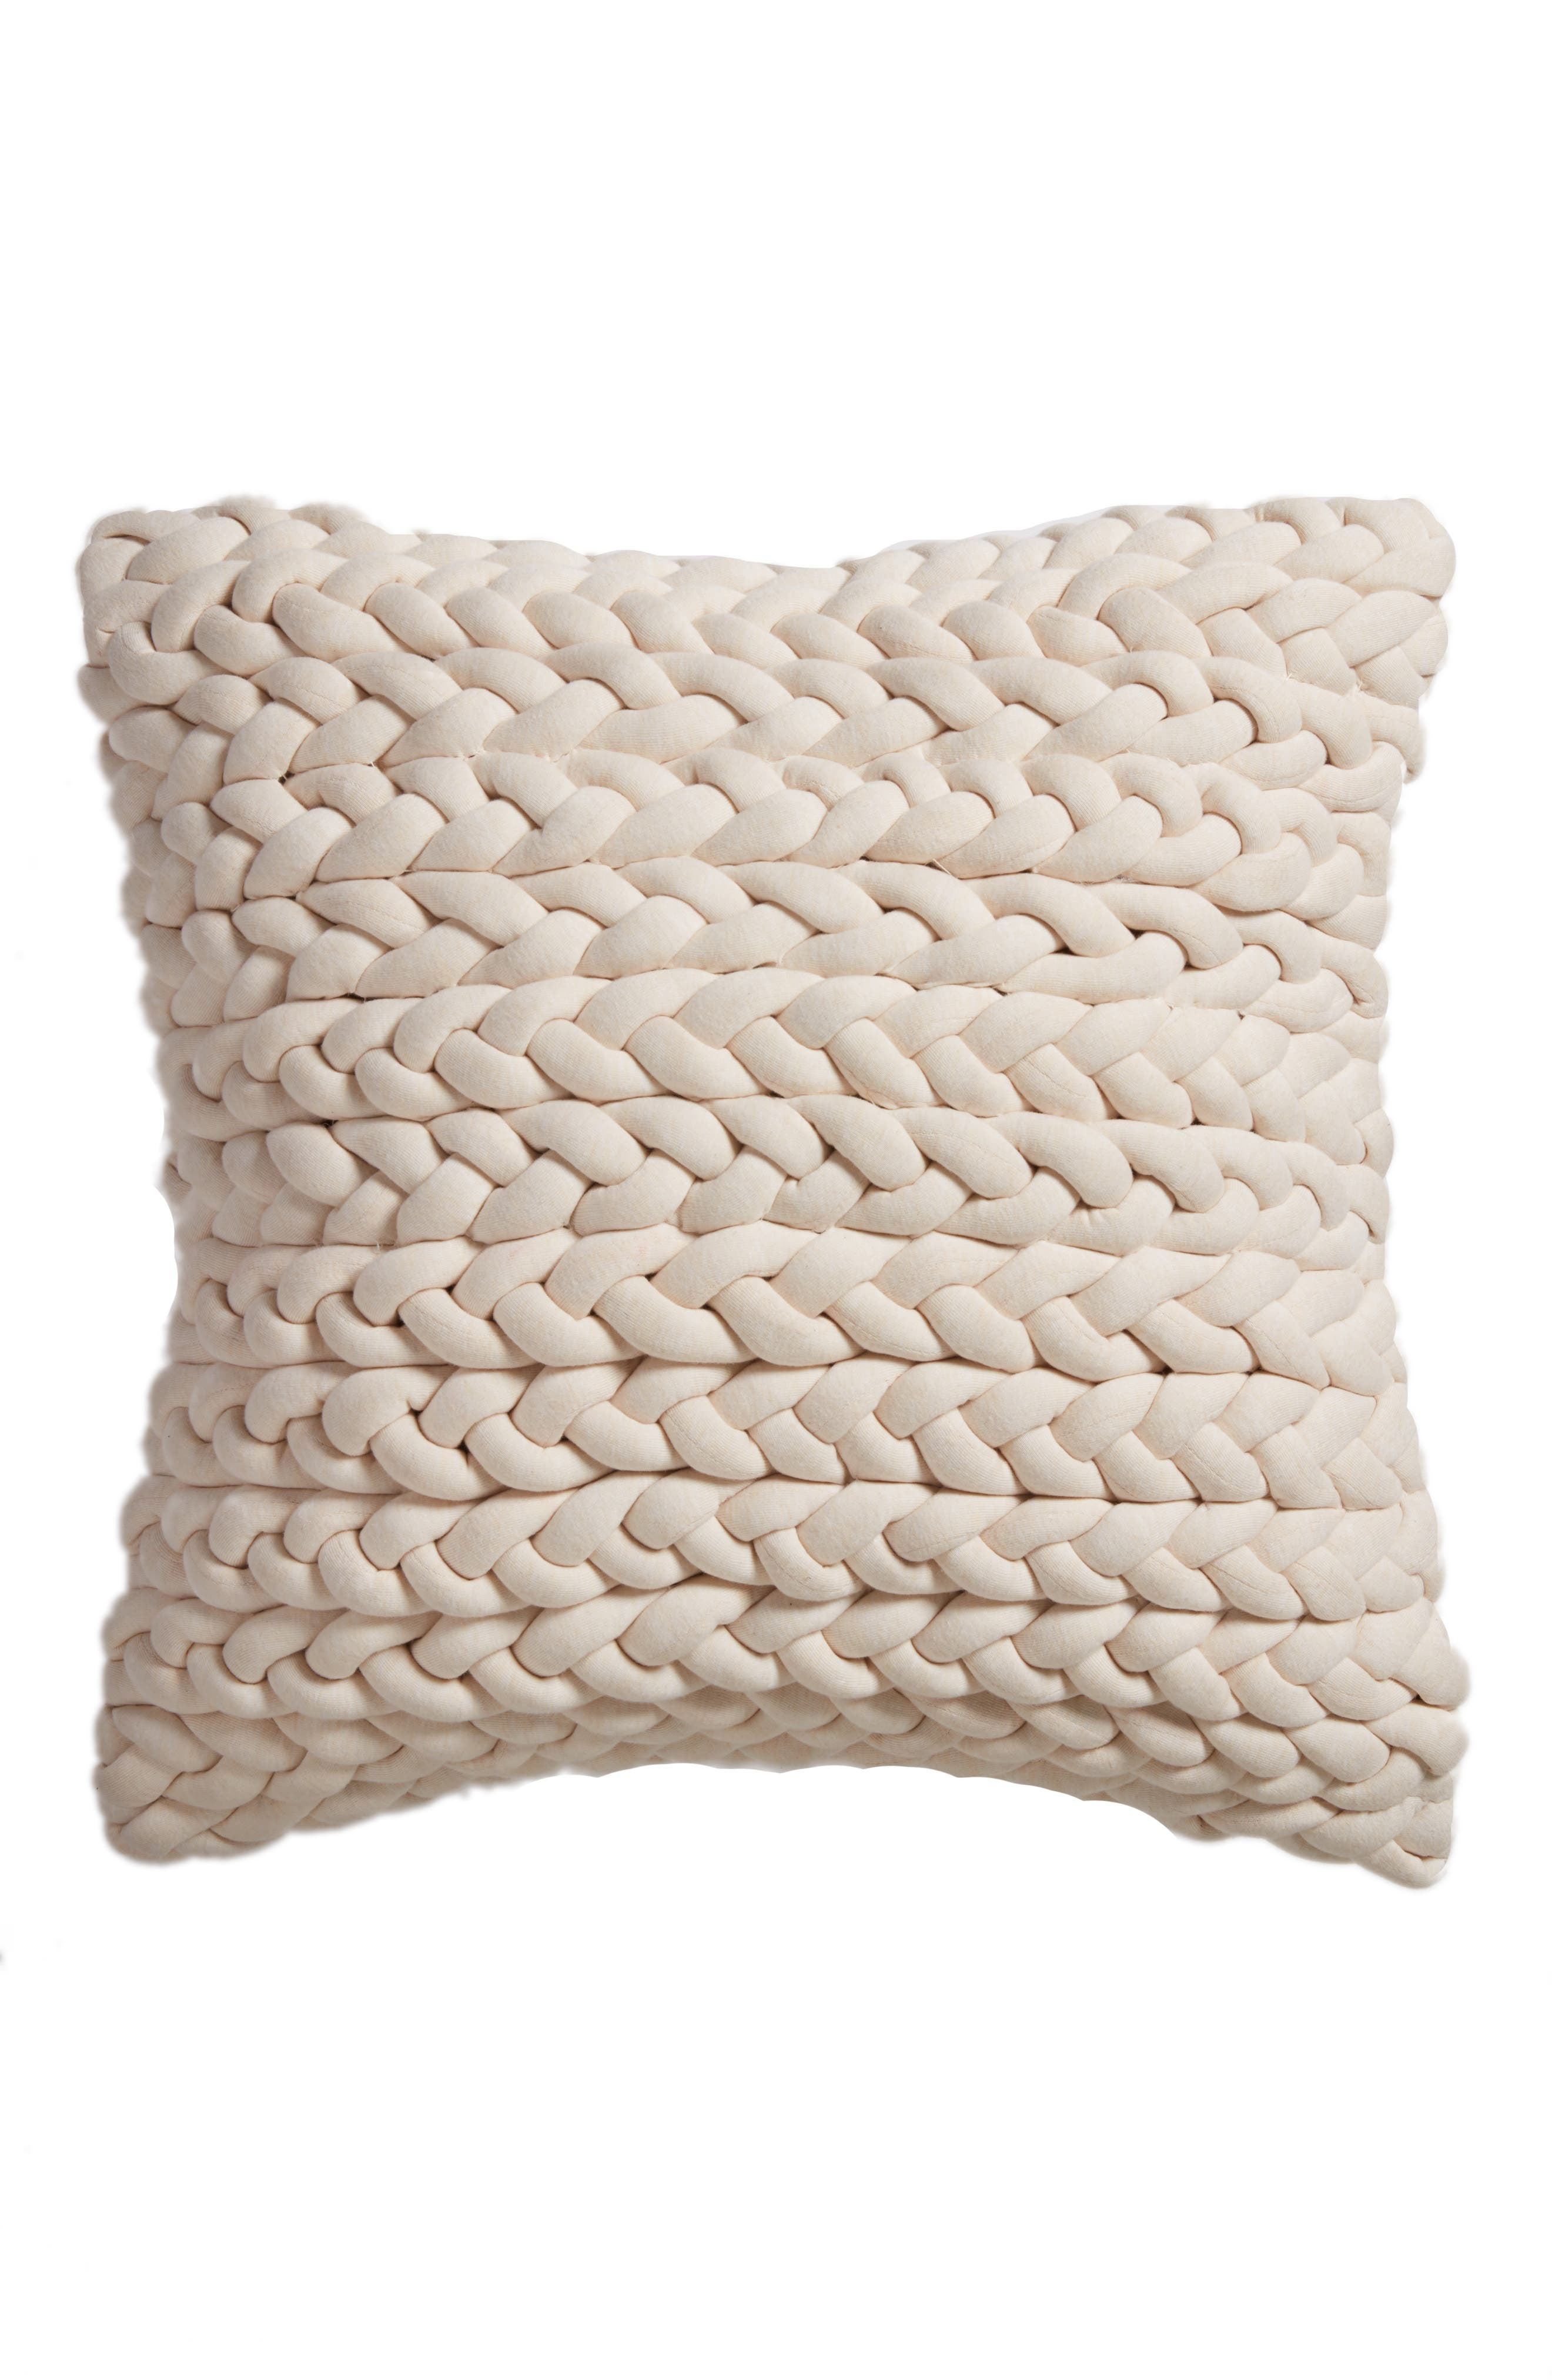 Jersey Braid Accent Pillow,                         Main,                         color, Beige Beach